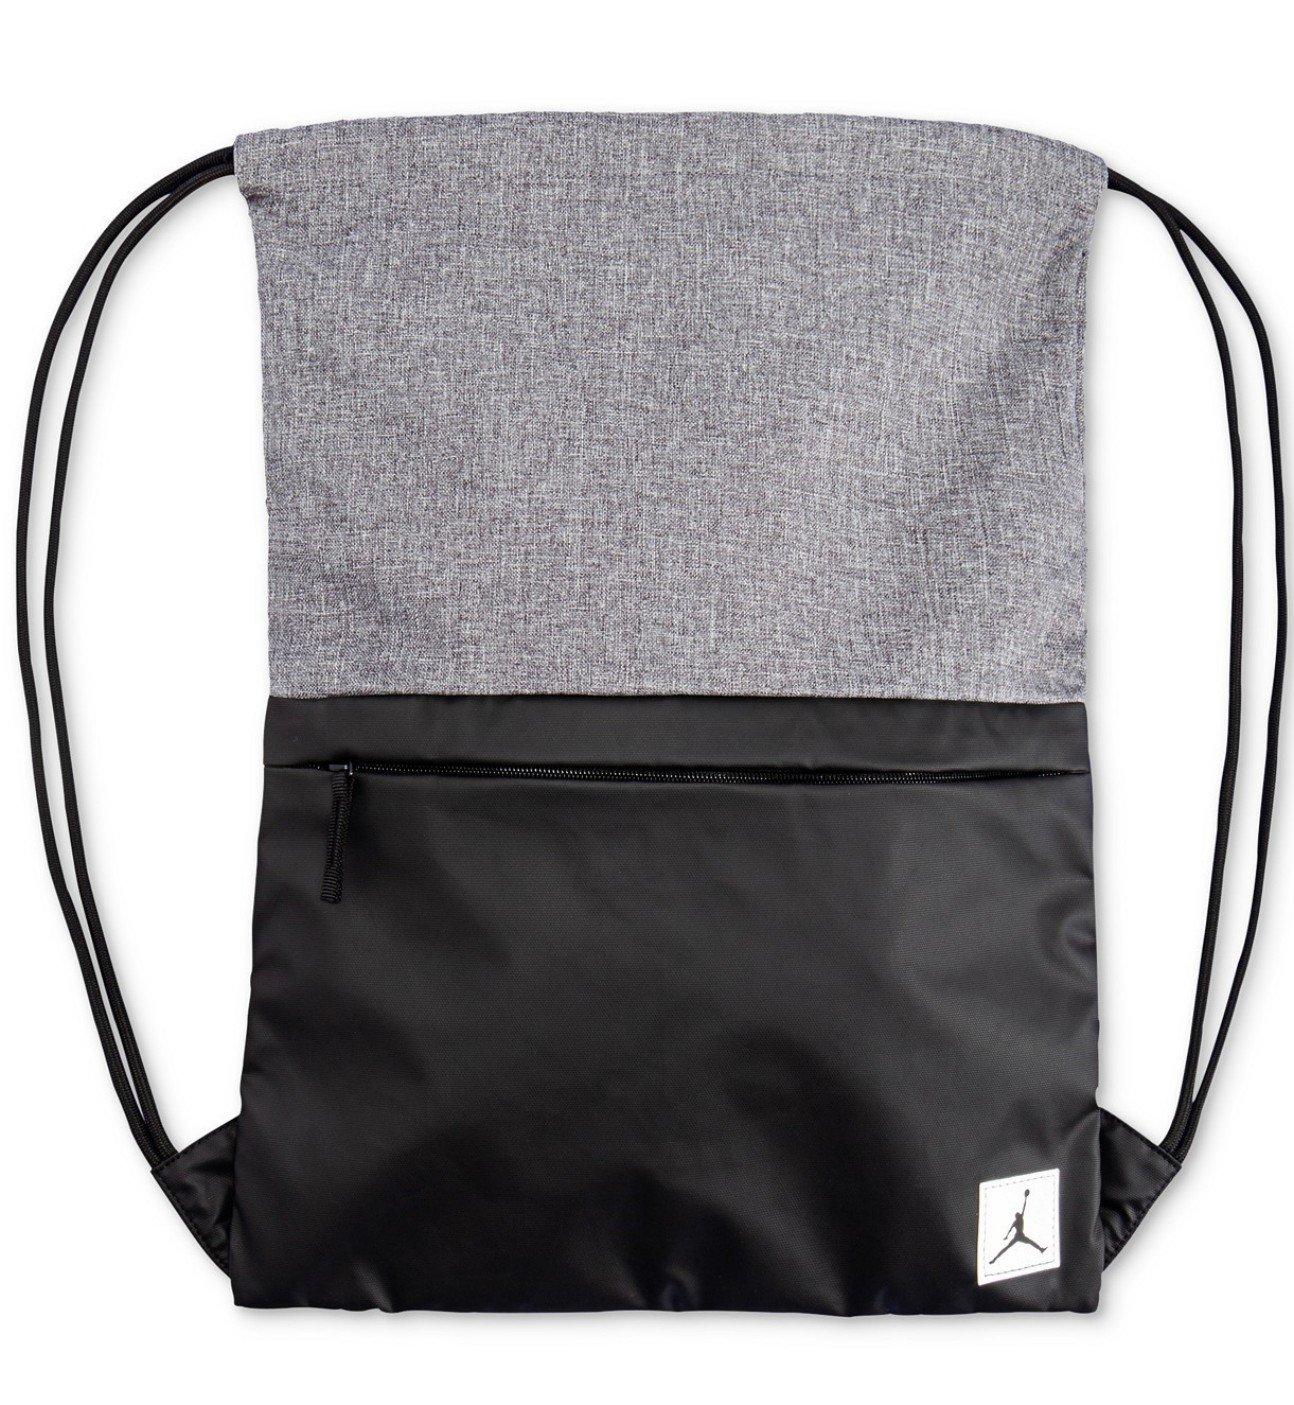 NIKE Air Jordan Hybrid Elite Sport Tote Drawstring Gym Sack Book Bag Black Wolf Grey